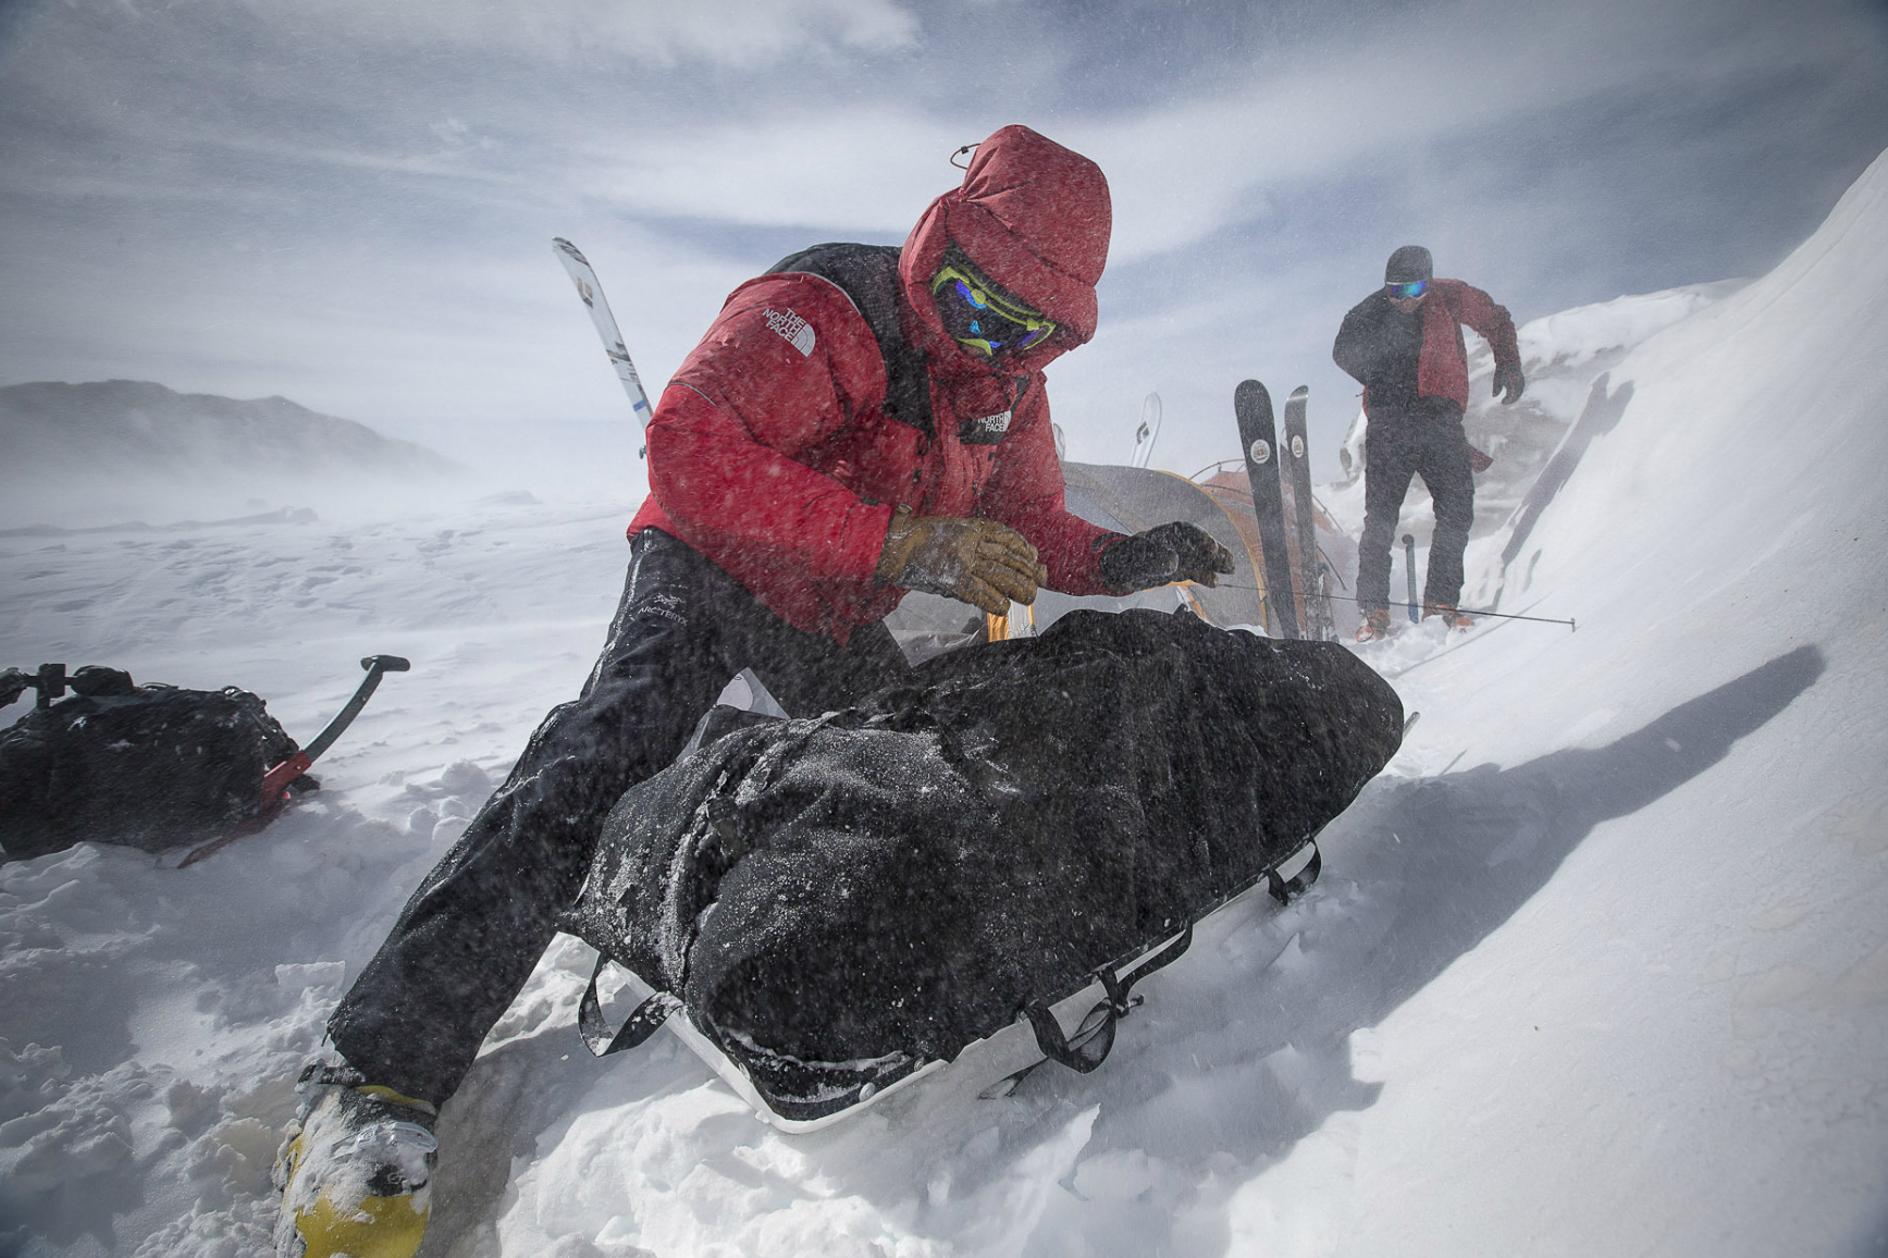 Cory-Richards-Photographer-Antarctica-6.jpg